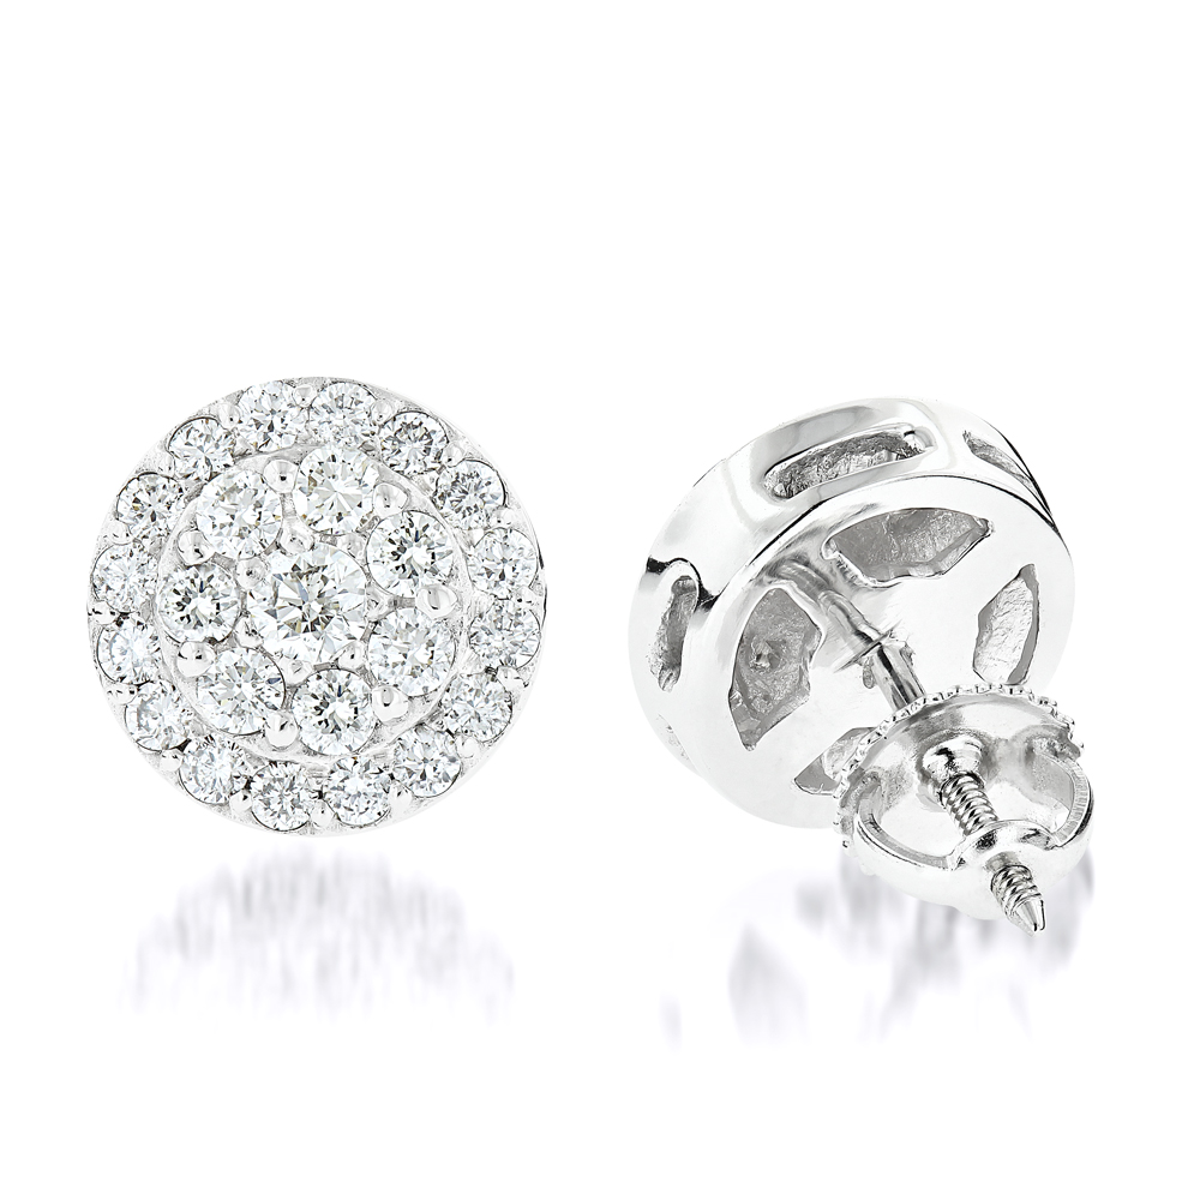 Diamond Cluster Earrings Studs 14K Gold 1.75ct